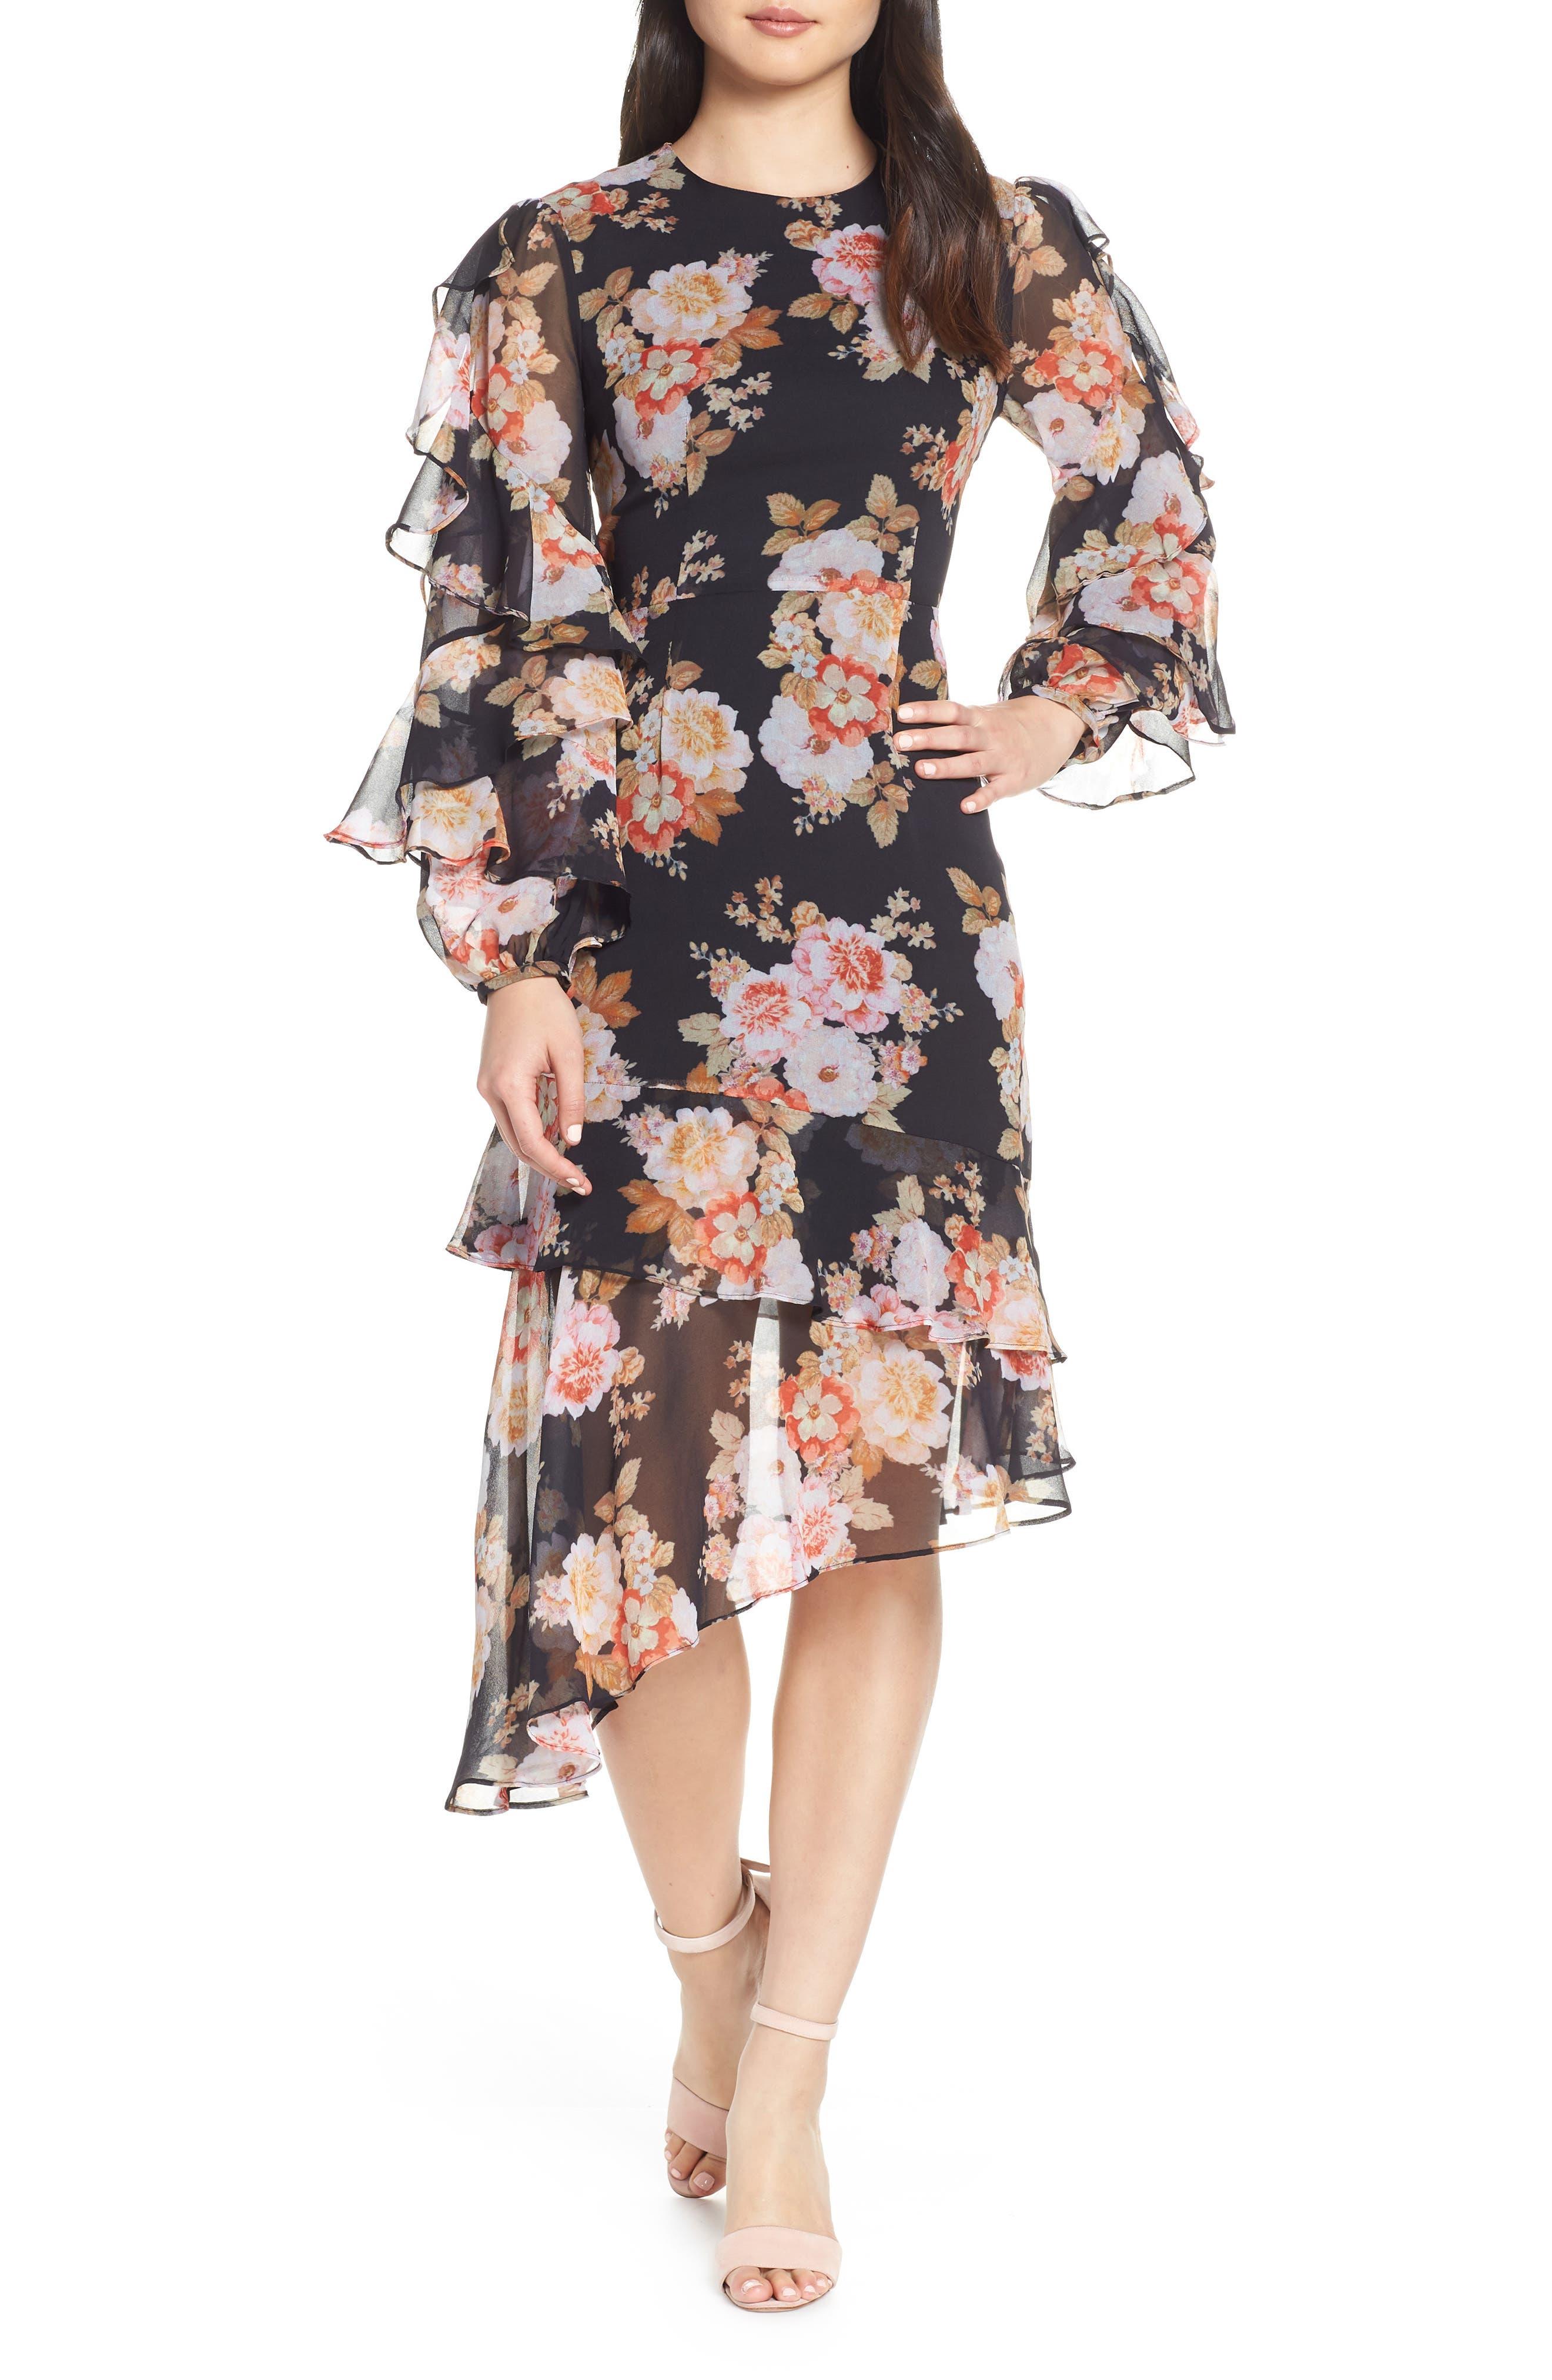 Cooper St Chateau Ruffle Sleeve Floral Midi Dress, Black